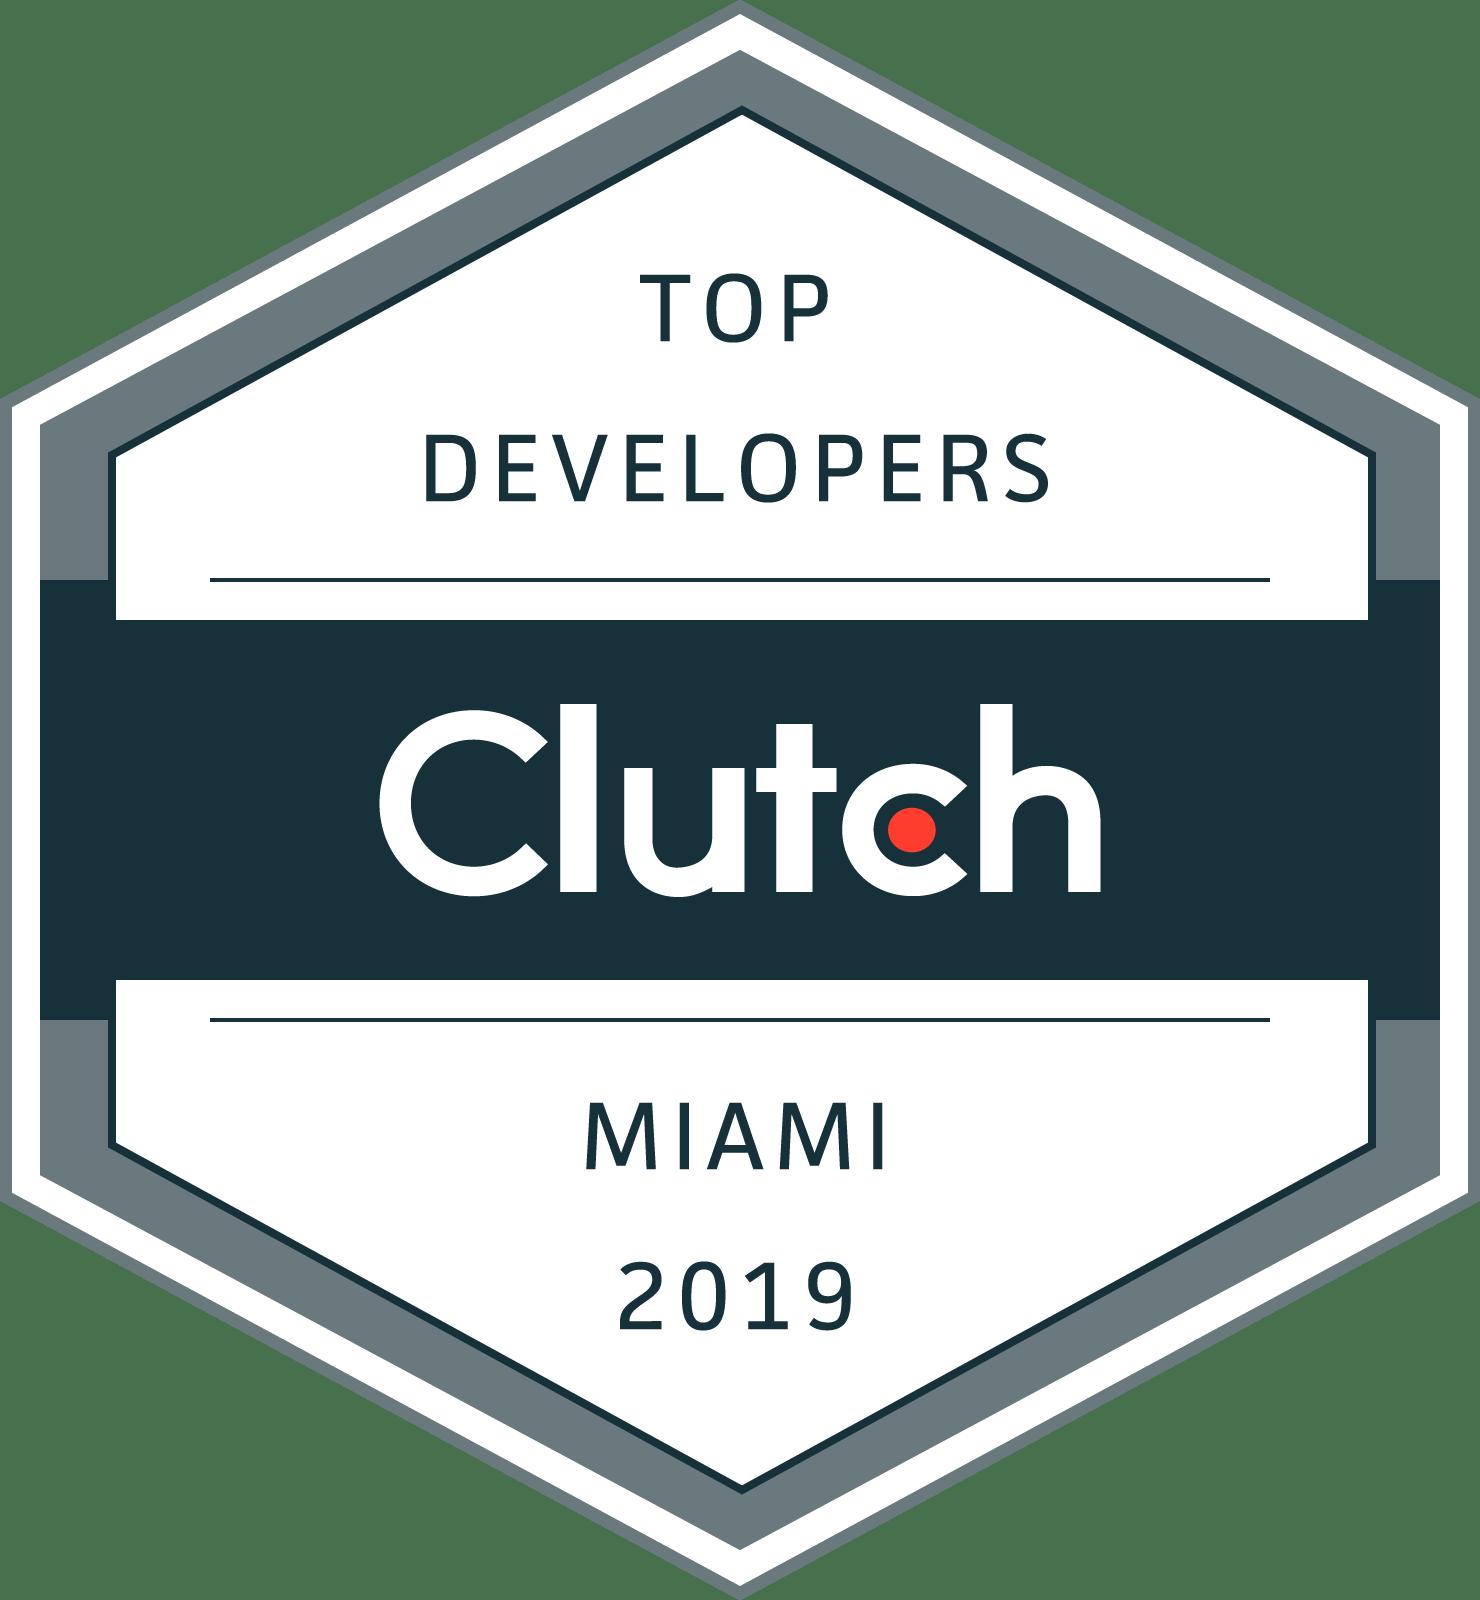 custom software solutions top developers miami 2019 custom software